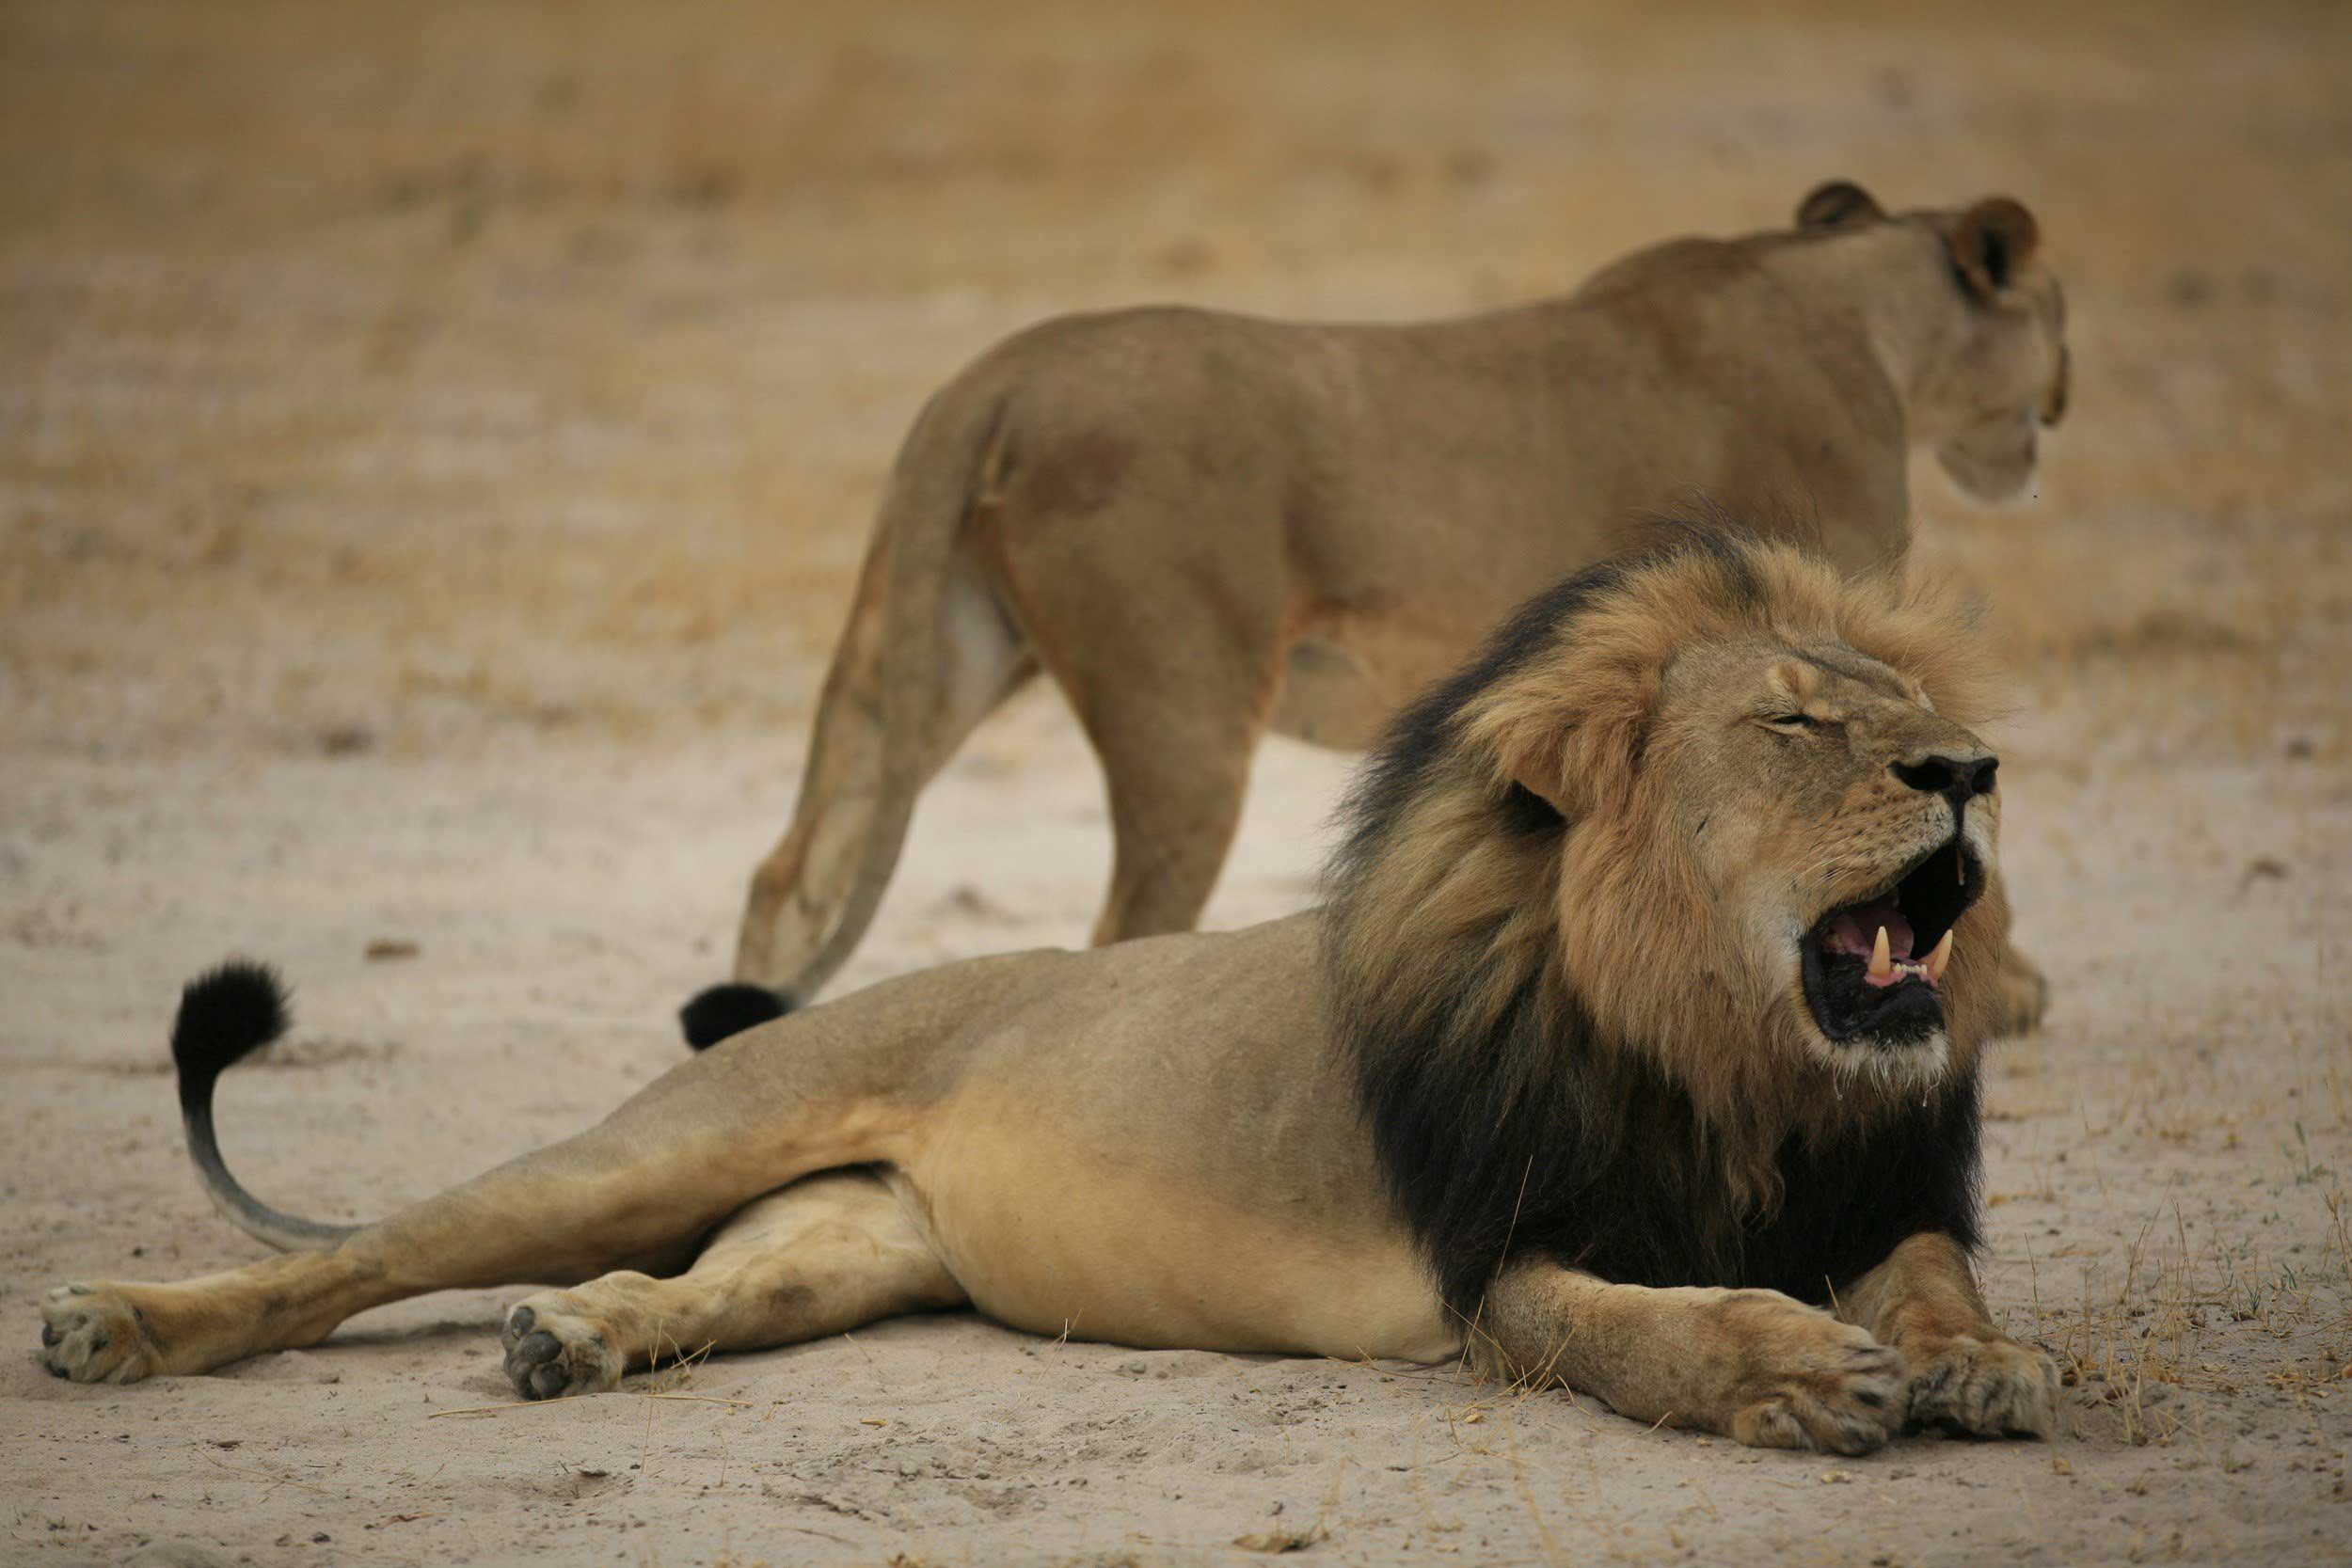 Much loved Zimbabwean lion, Cecil, in Zimbabwe on Oct. 21, 2012